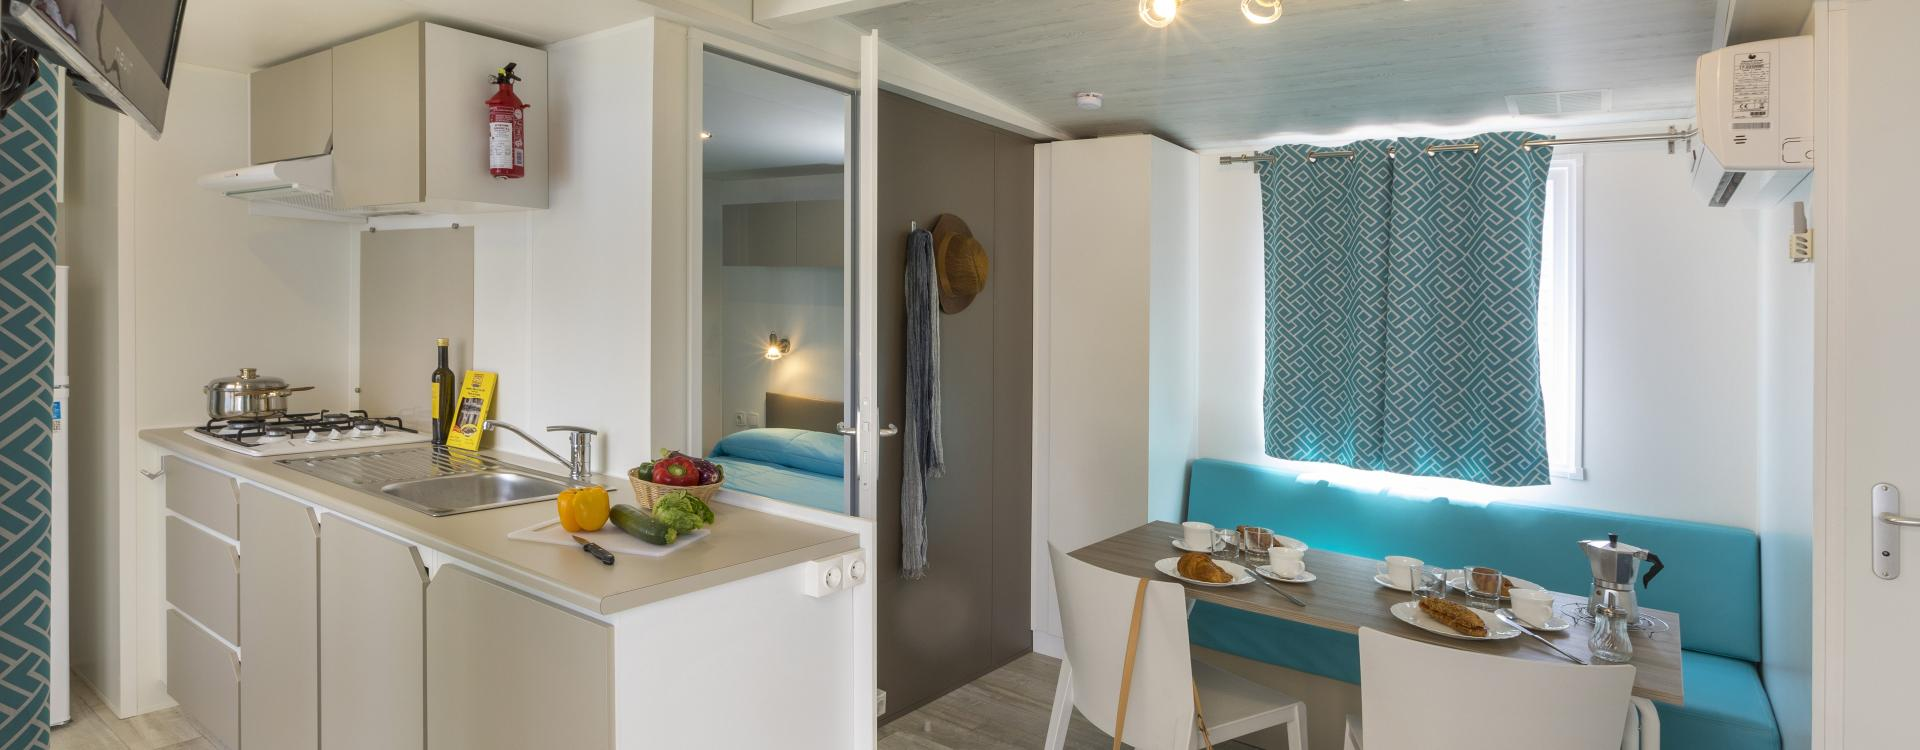 Interieur Mobil Home Empordà - Camping Valldaro